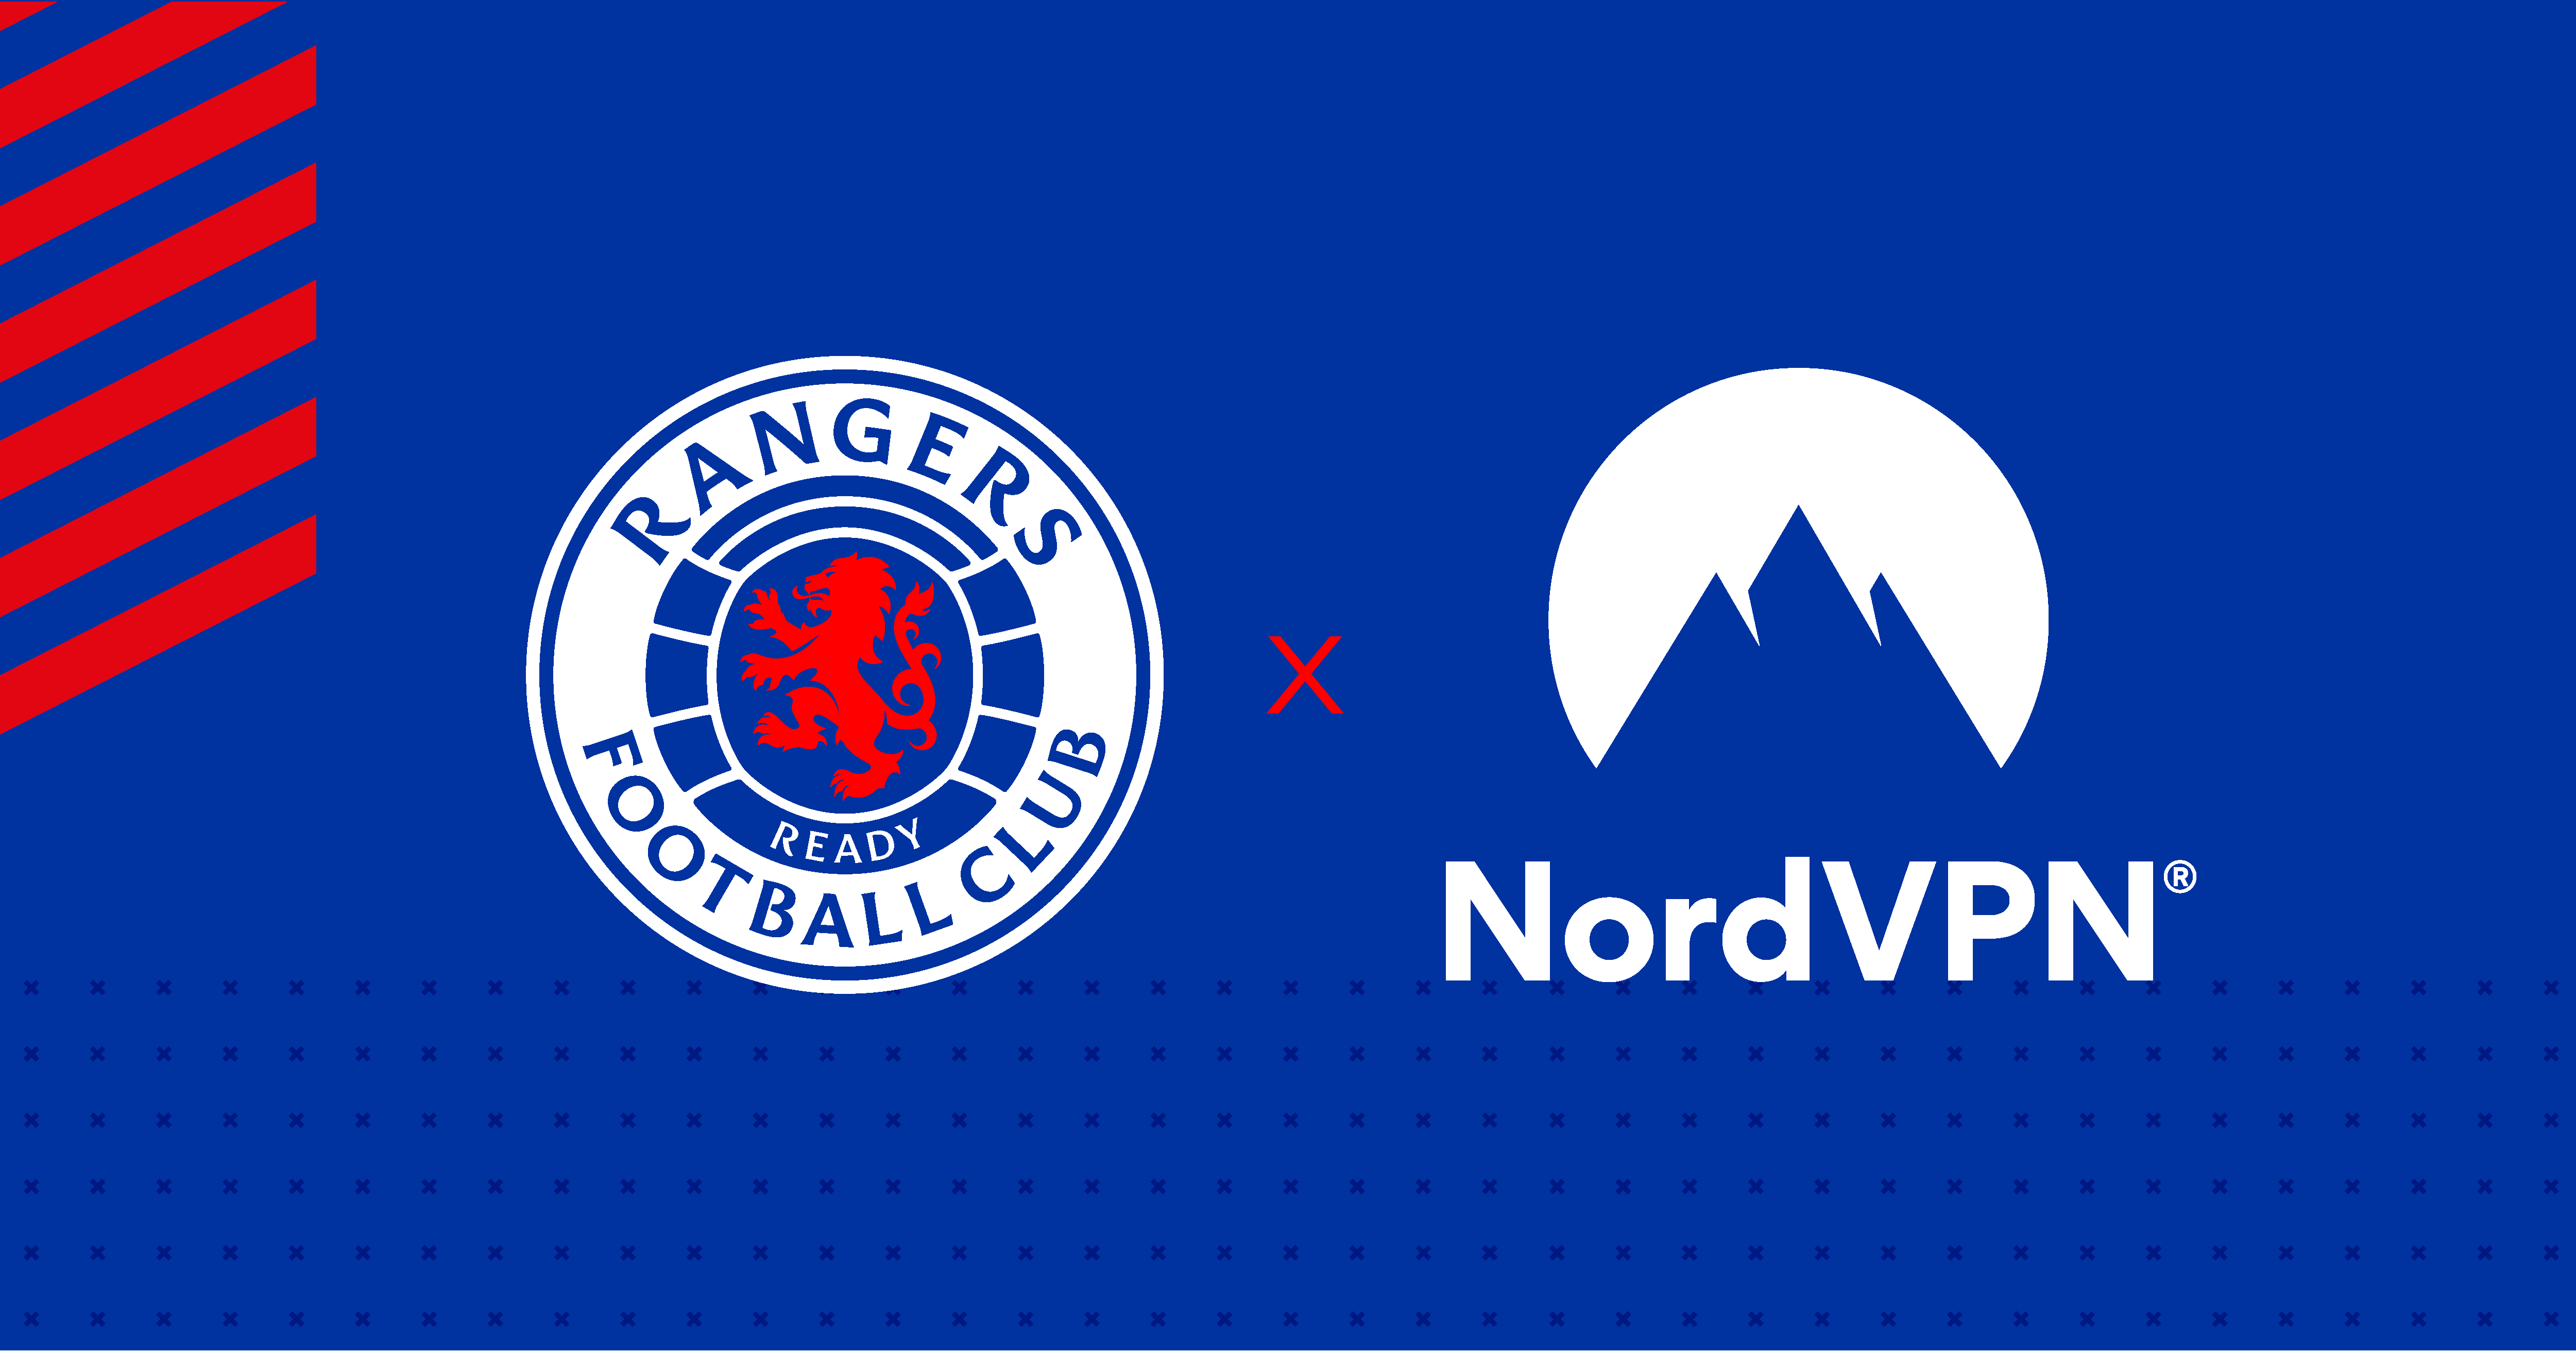 NordVPN is the new partner of Rangers Football Club